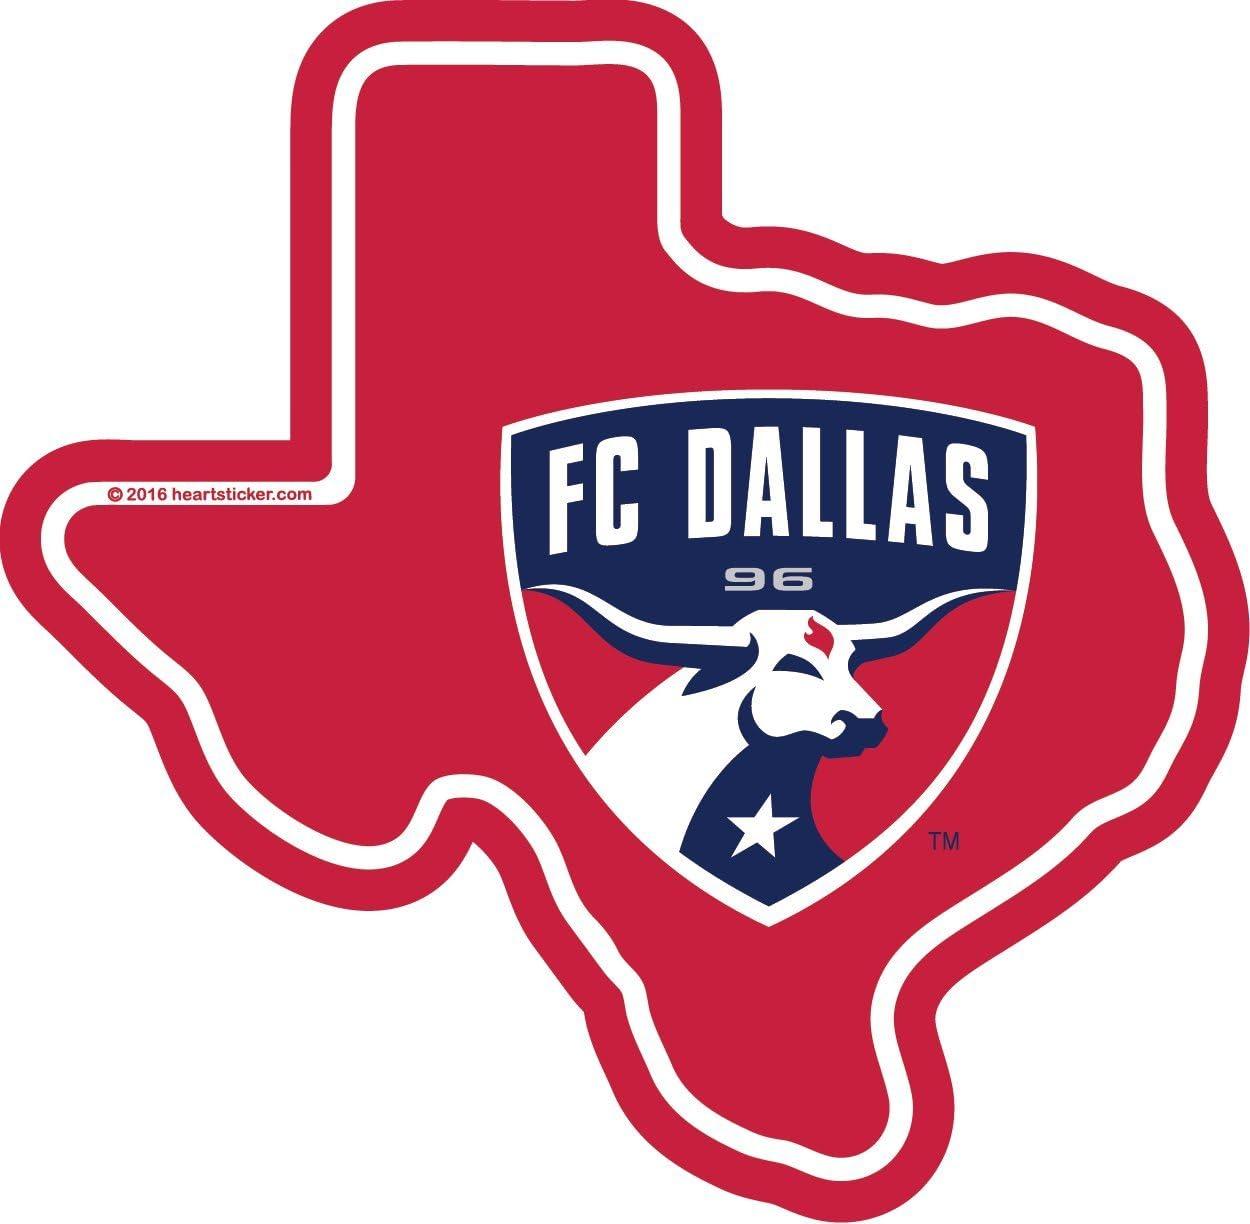 FC Dallas Texas Sticker | TX Shaped Label Texas| Apply to Mug Phone Laptop Water Bottle Decal Cooler Bumper | Rocket Cowboy Texan Mavs Ranger Astro Lone Star Spur Deep Heart MLS Soccer